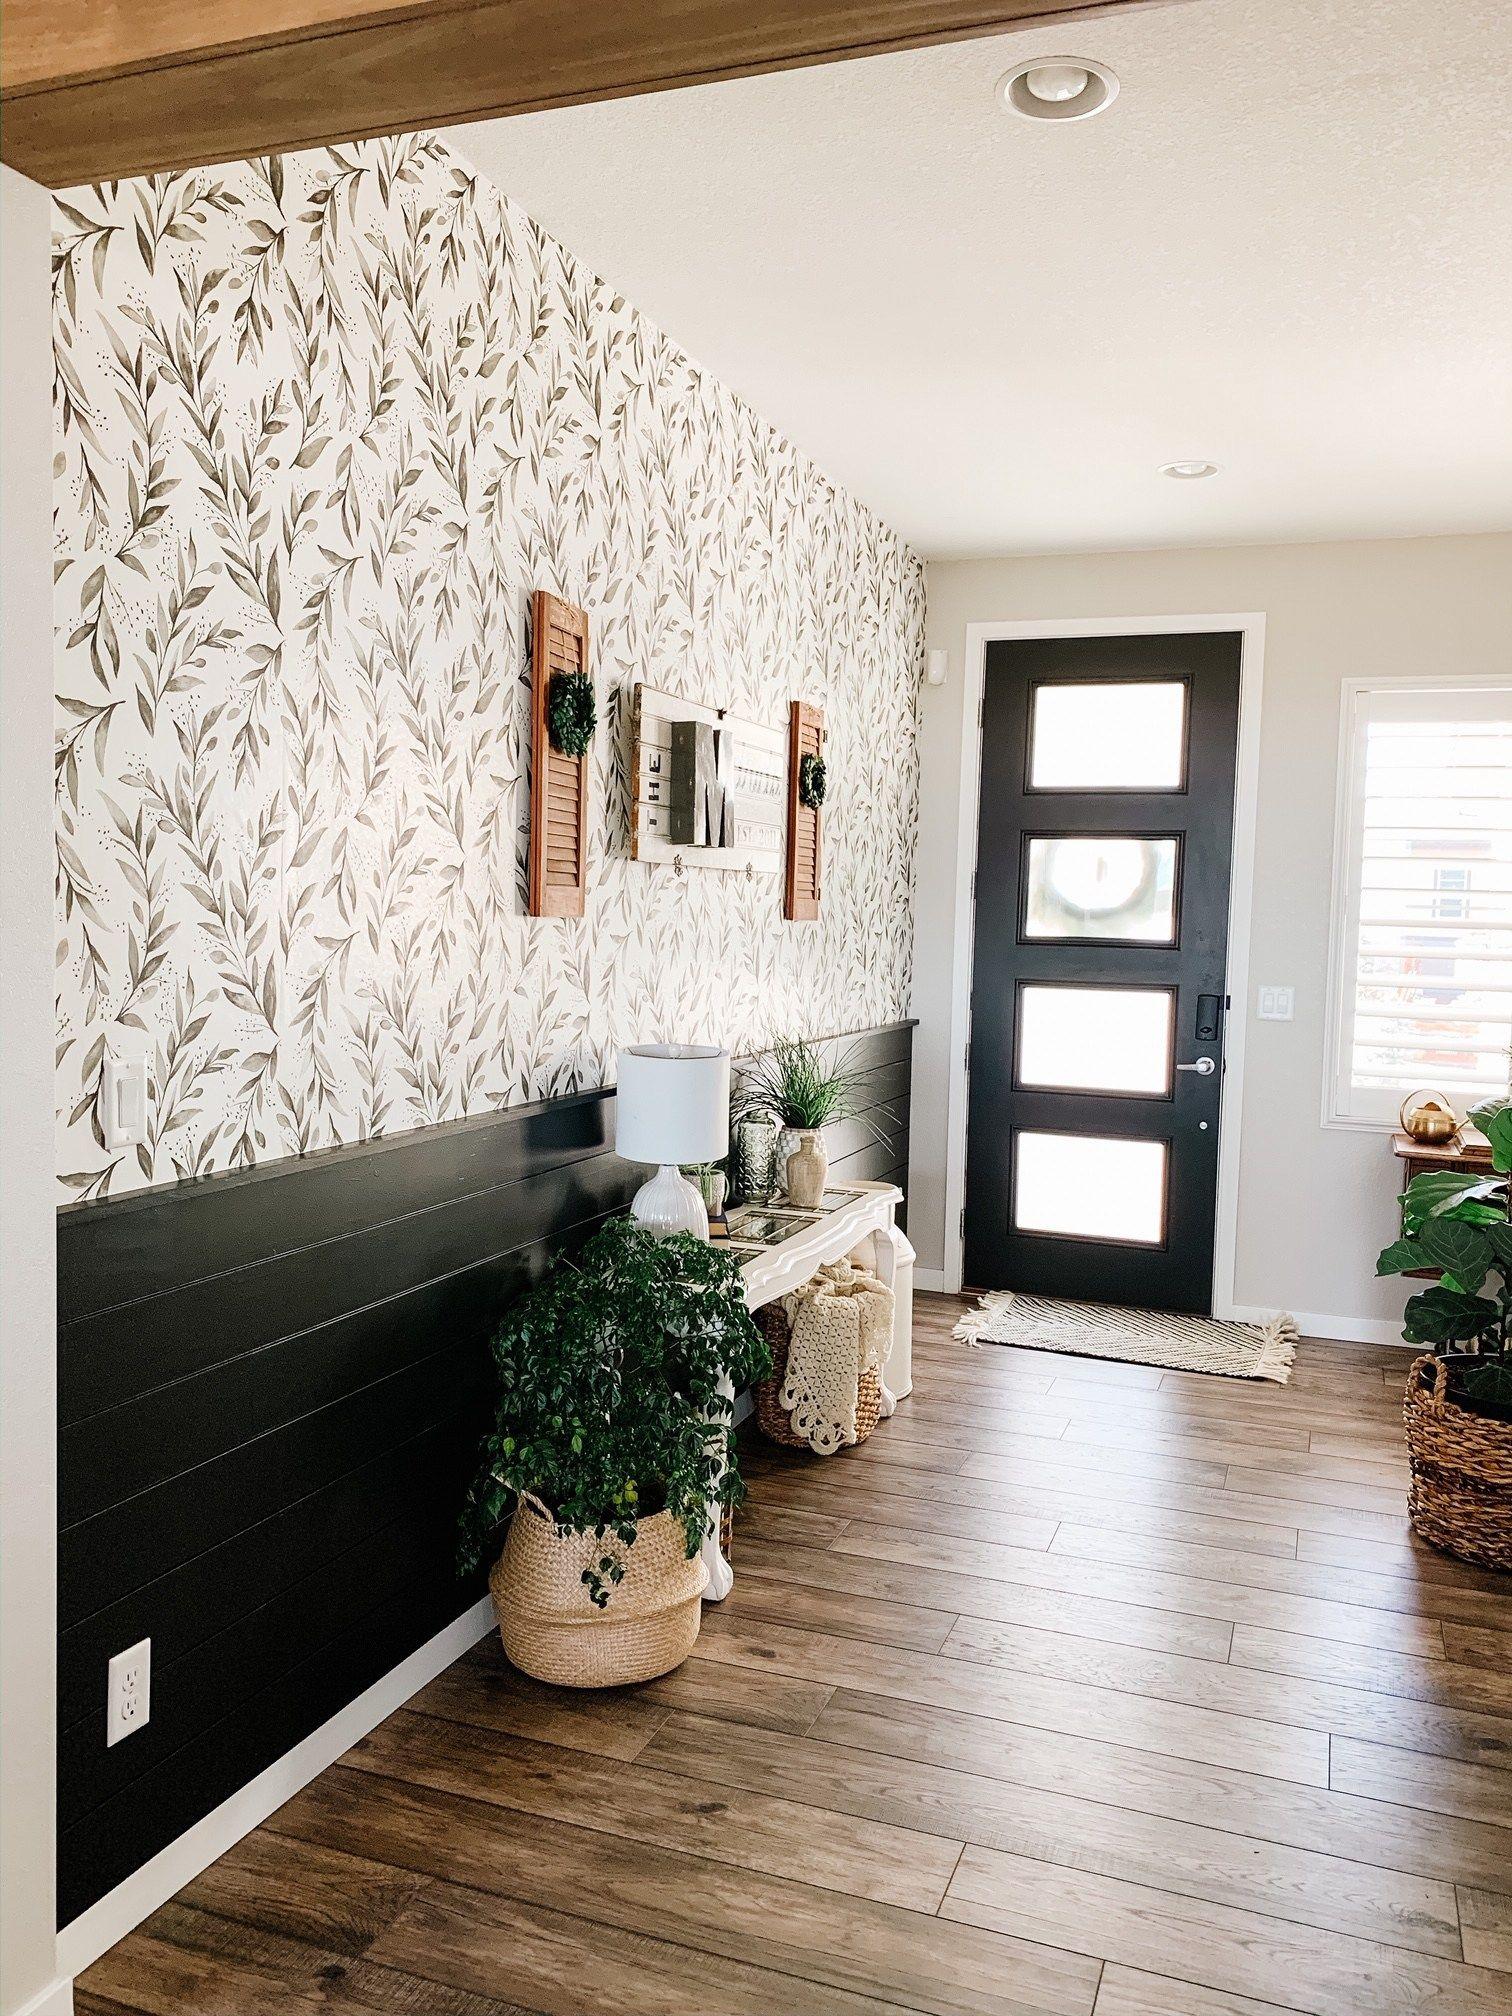 Entryway Peel And Stick Wallpaper Sprucing Up Mamahood Wallpapered Entryway Farmhouse Wallpaper Hallway Wallpaper